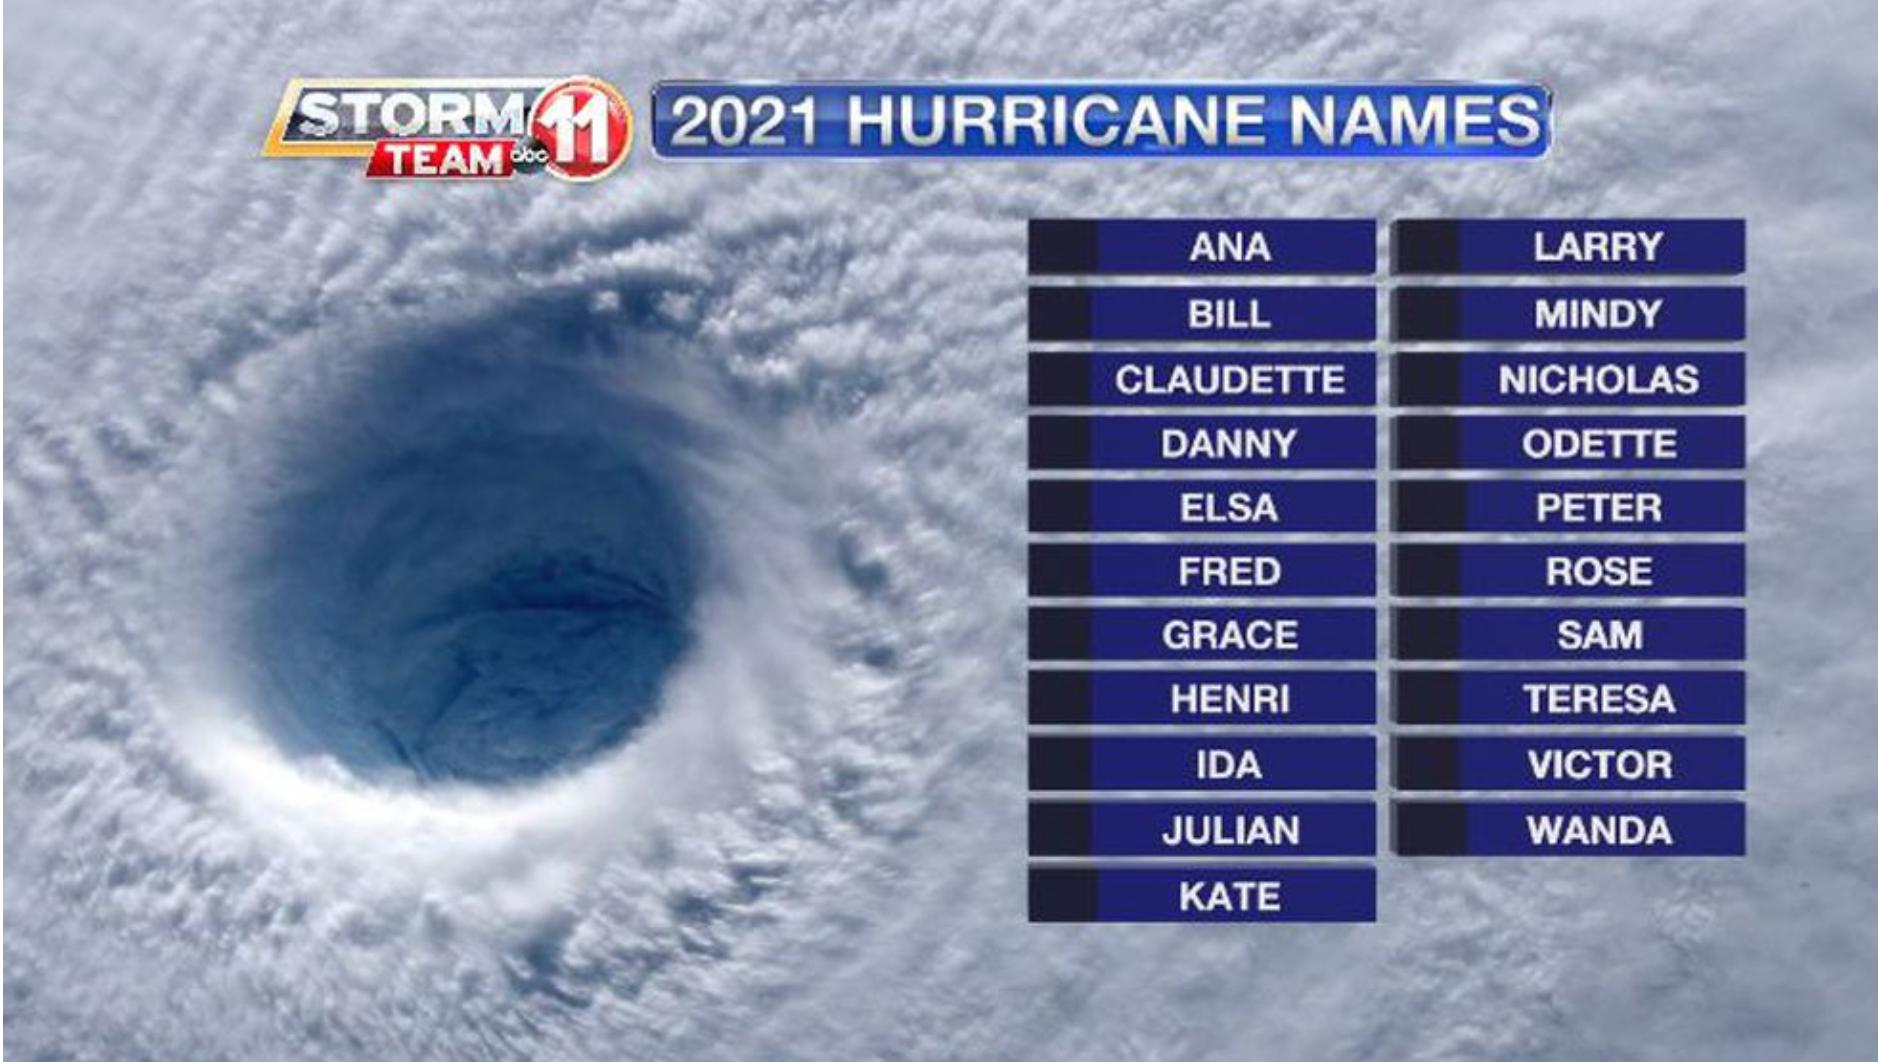 2021 Hurricane Season predictions